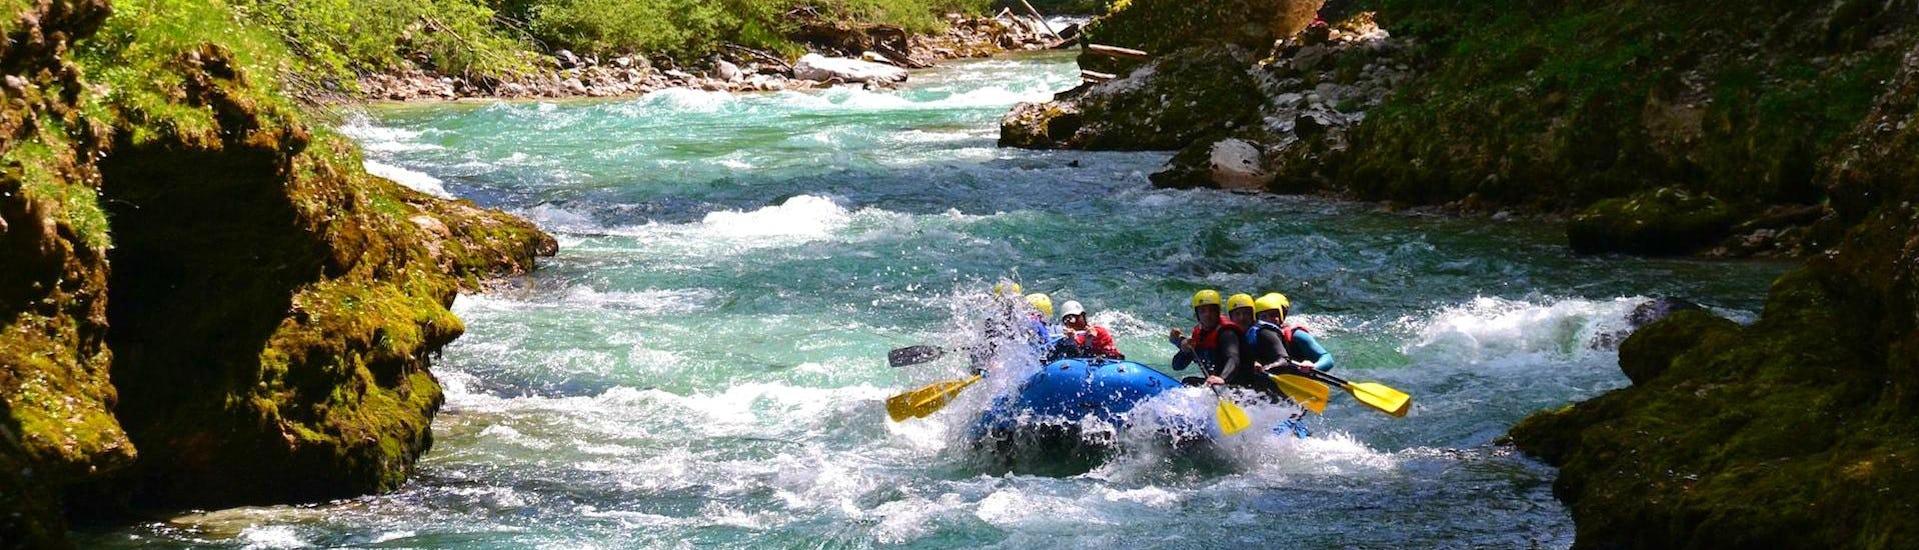 rafting-half-day-salza-adventure-outdoor-strobl-hero